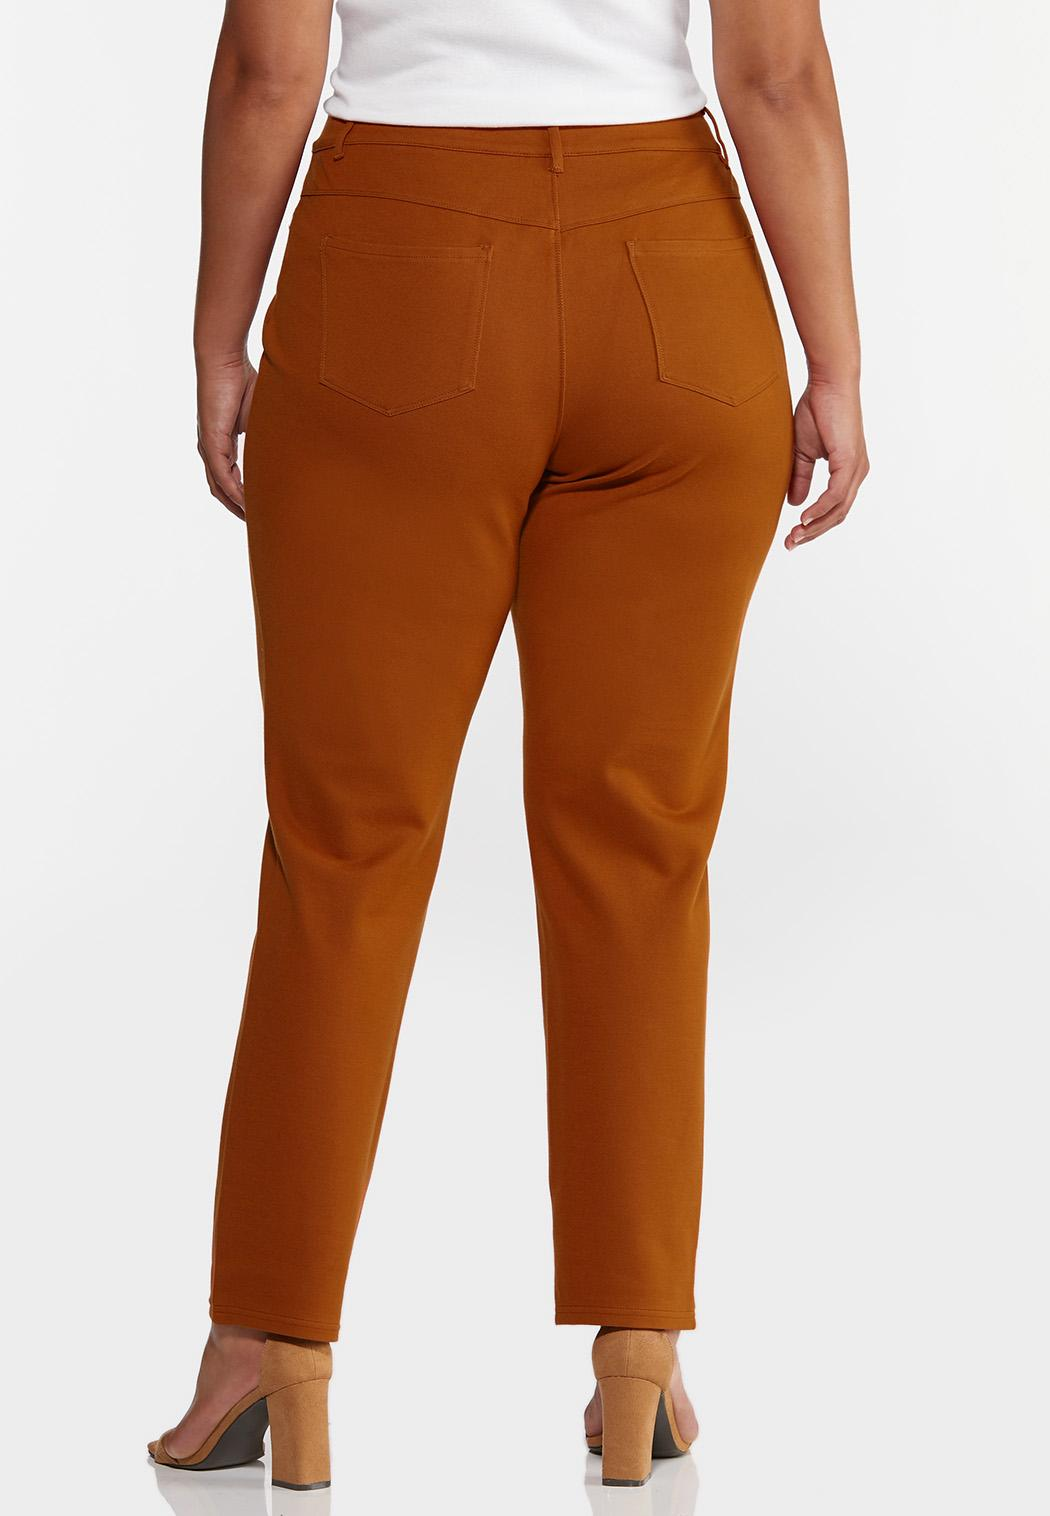 Plus Petite Colored Ponte Pants (Item #44320125)